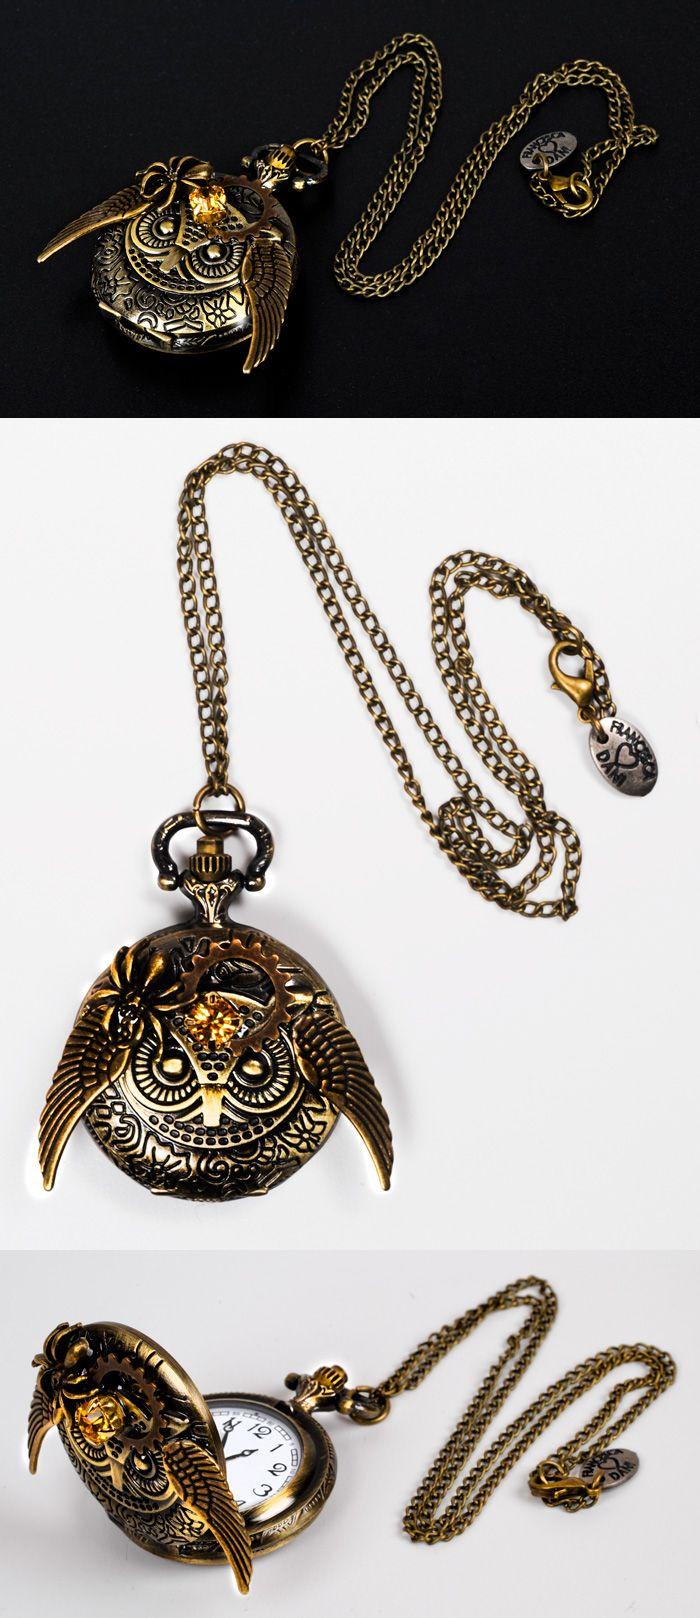 STEAMPUNK LUXURY OWL WATCH by Francesca Dani